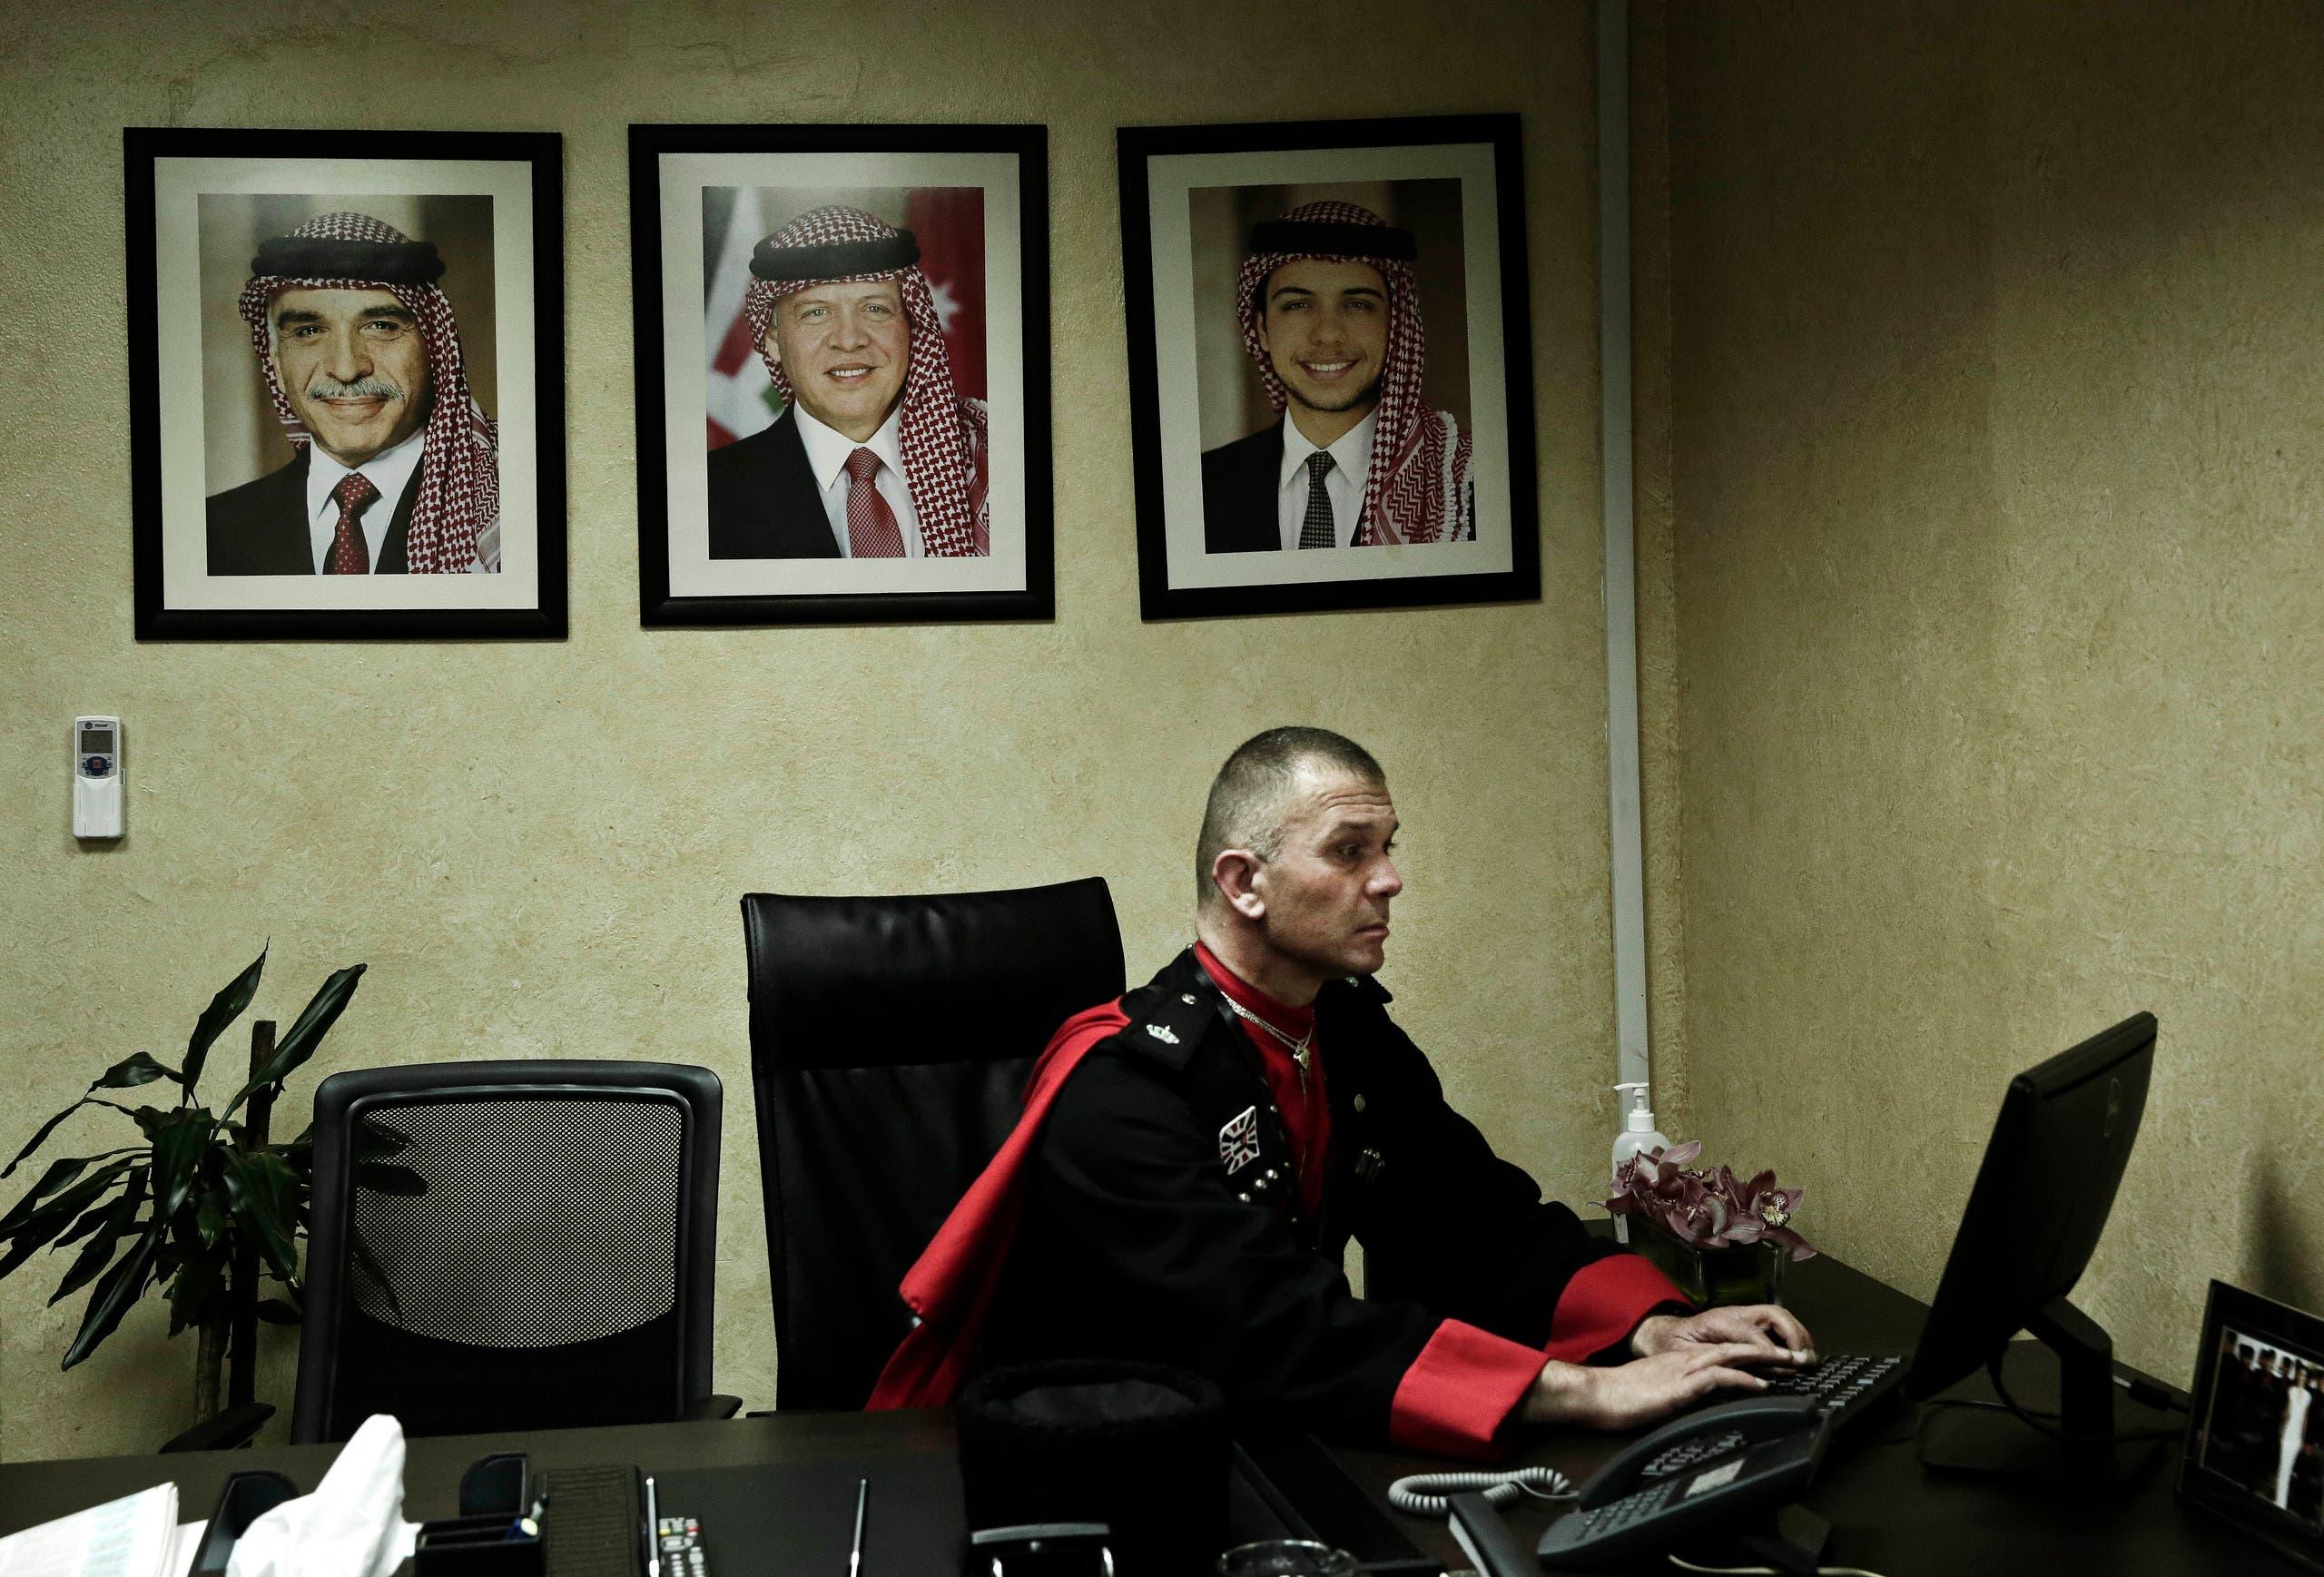 In this Monday, Jan. 11, 2016 photo, 45 year-old Circassian guard leader Major Ayman Abzakh, works at the Circassian Headquarters in Basman Palace, in Amman, Jordan.